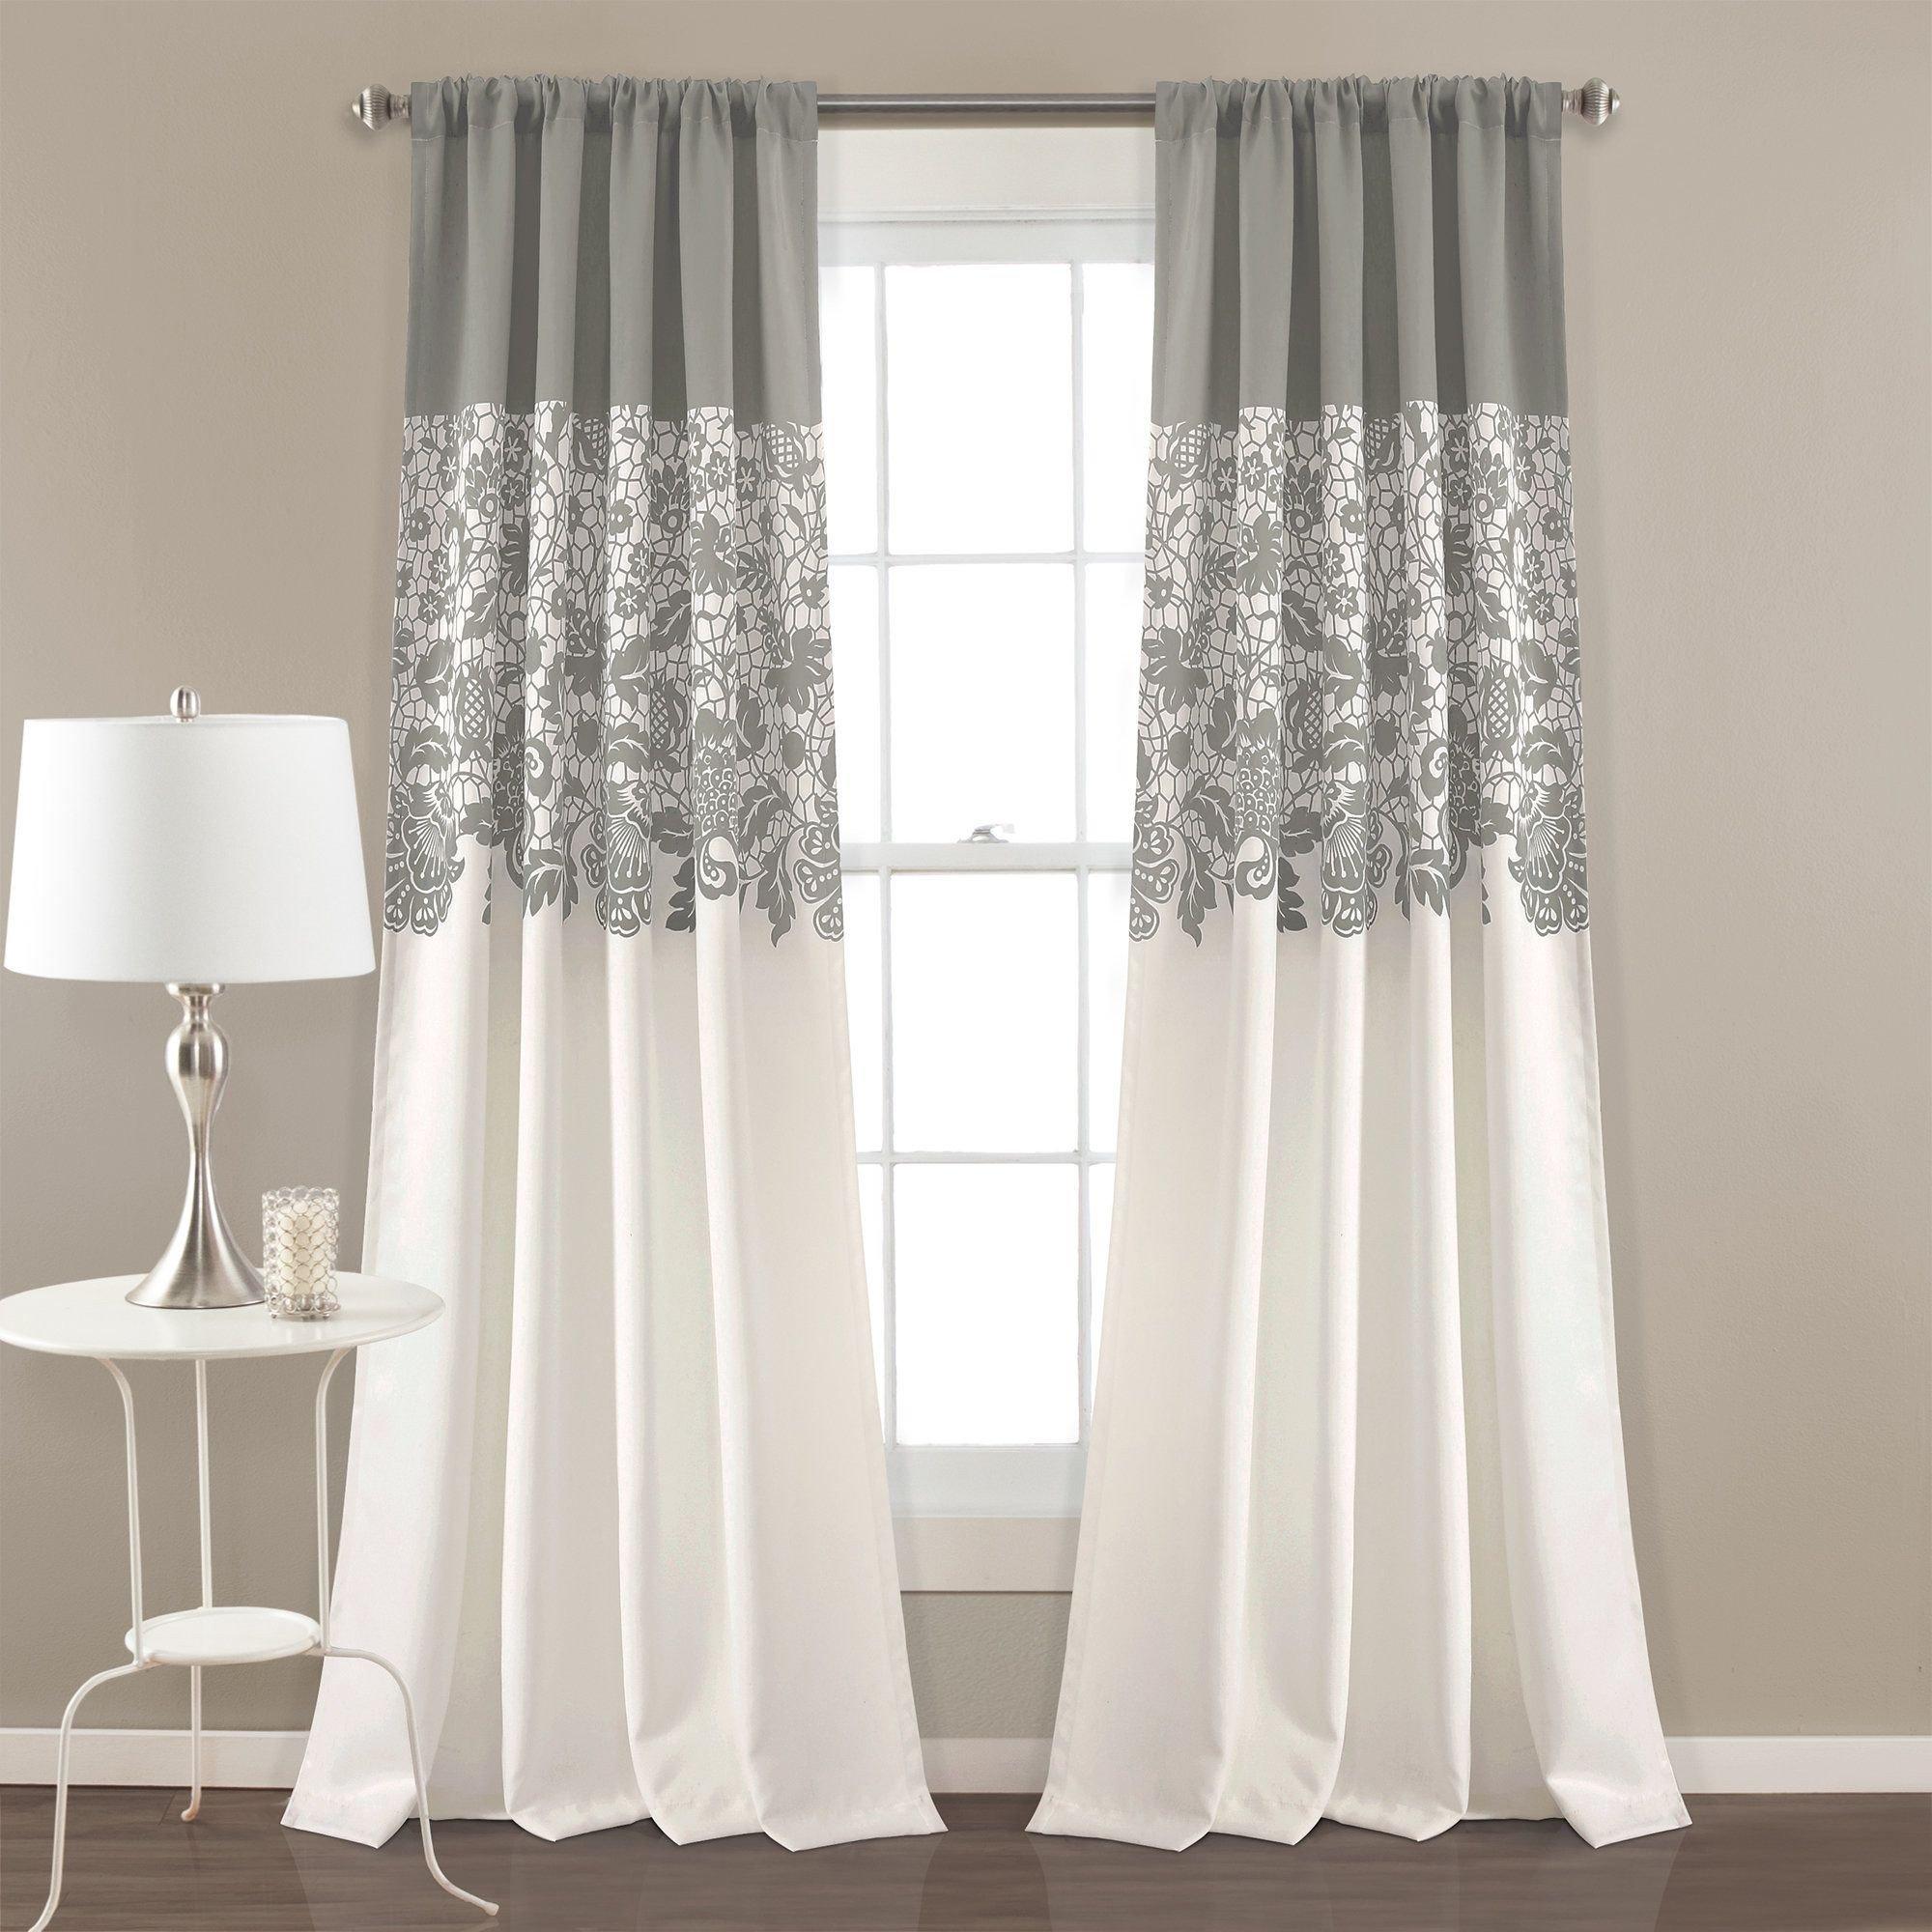 Curtains for Bedroom Windows Best Of Santa Fe Print Floral Room Darkening thermal Rod Pocket